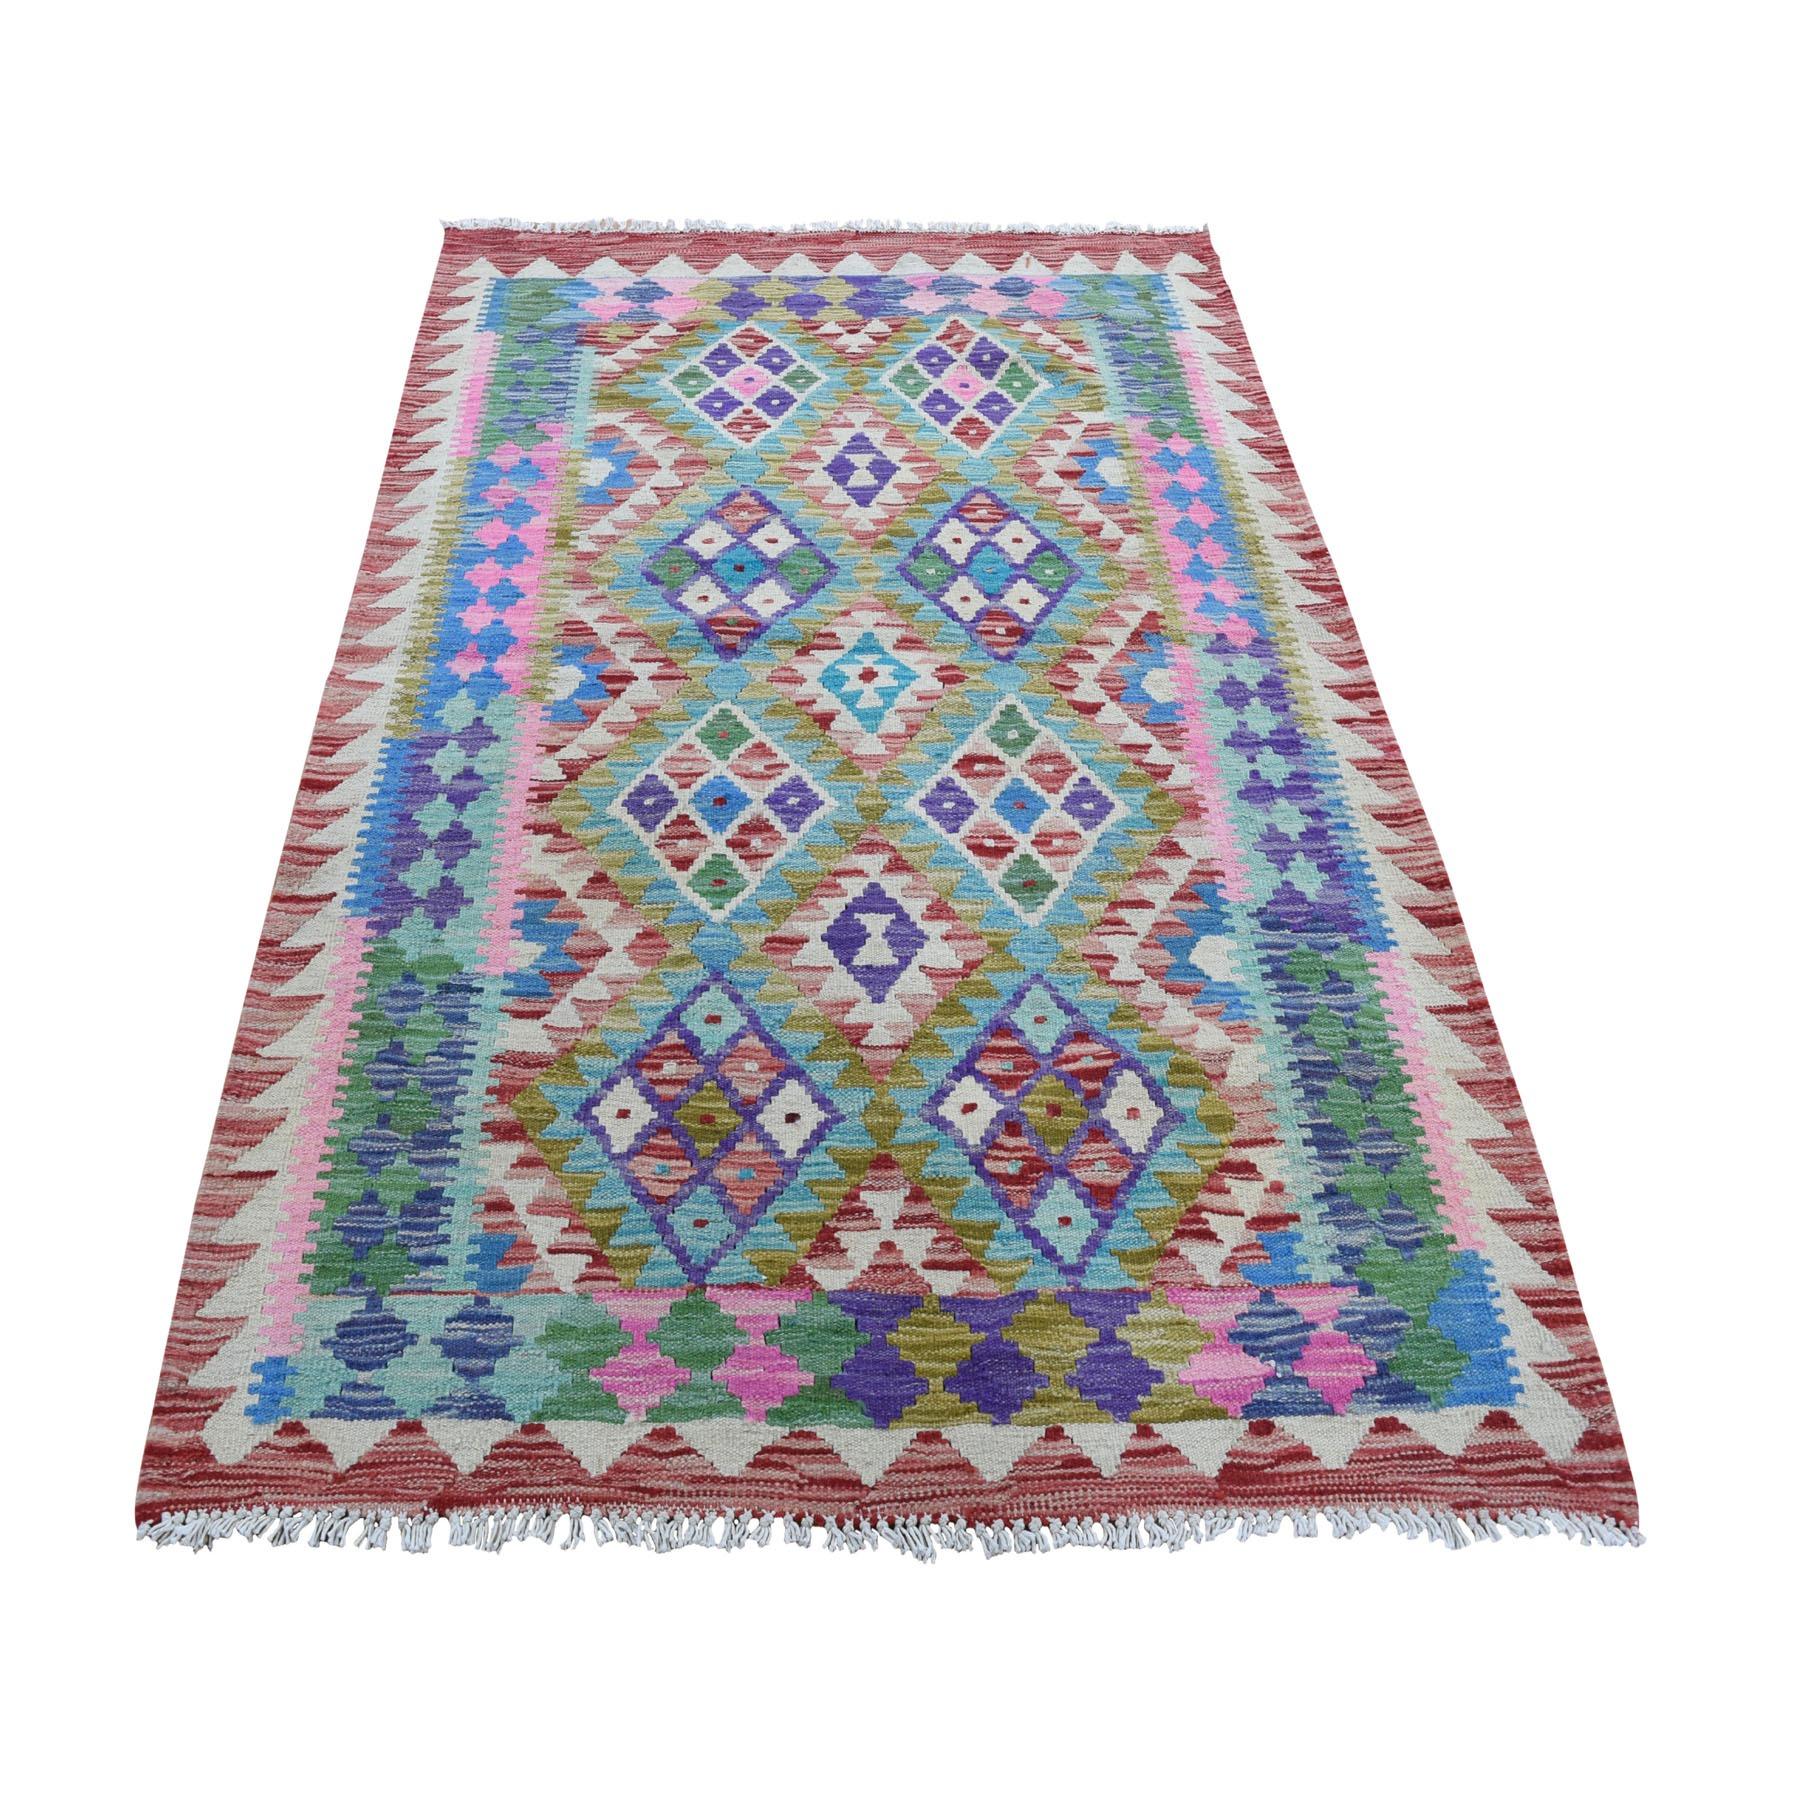 "3'5""X5' Colorful Afghan Kilim Pure Wool Hand Woven Oriental Rug moad8ada"